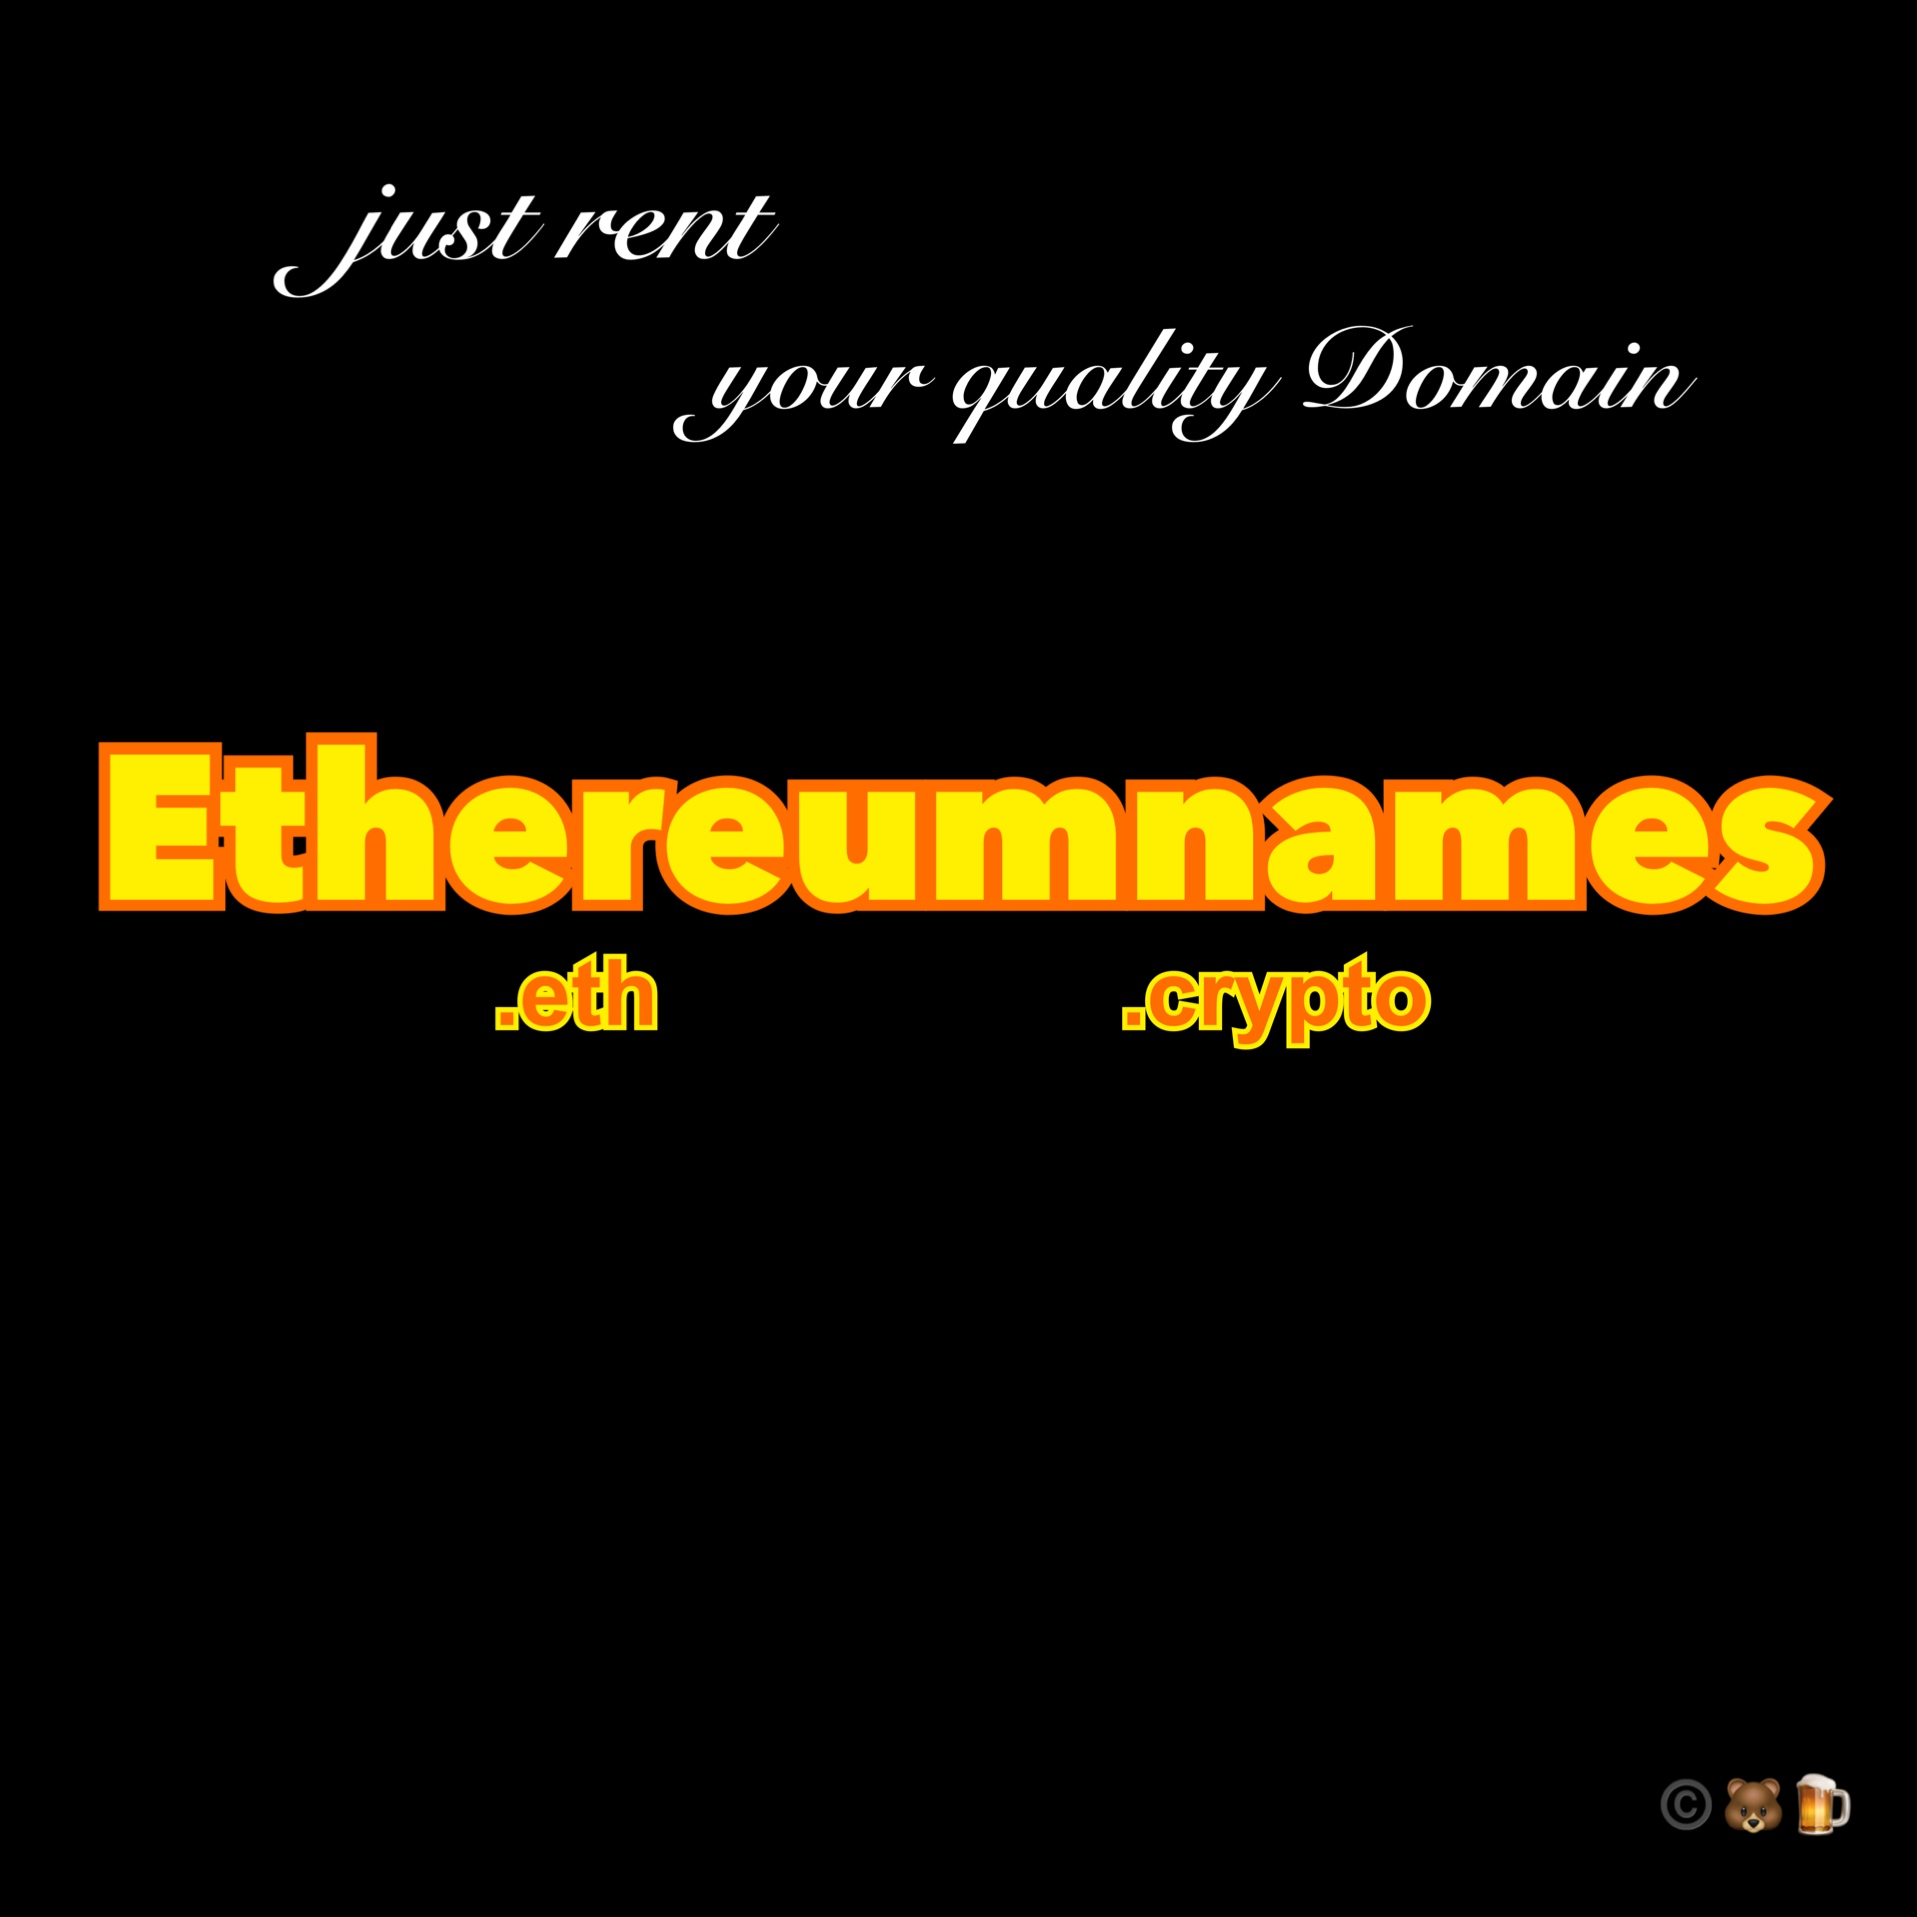 etereumnames.eth